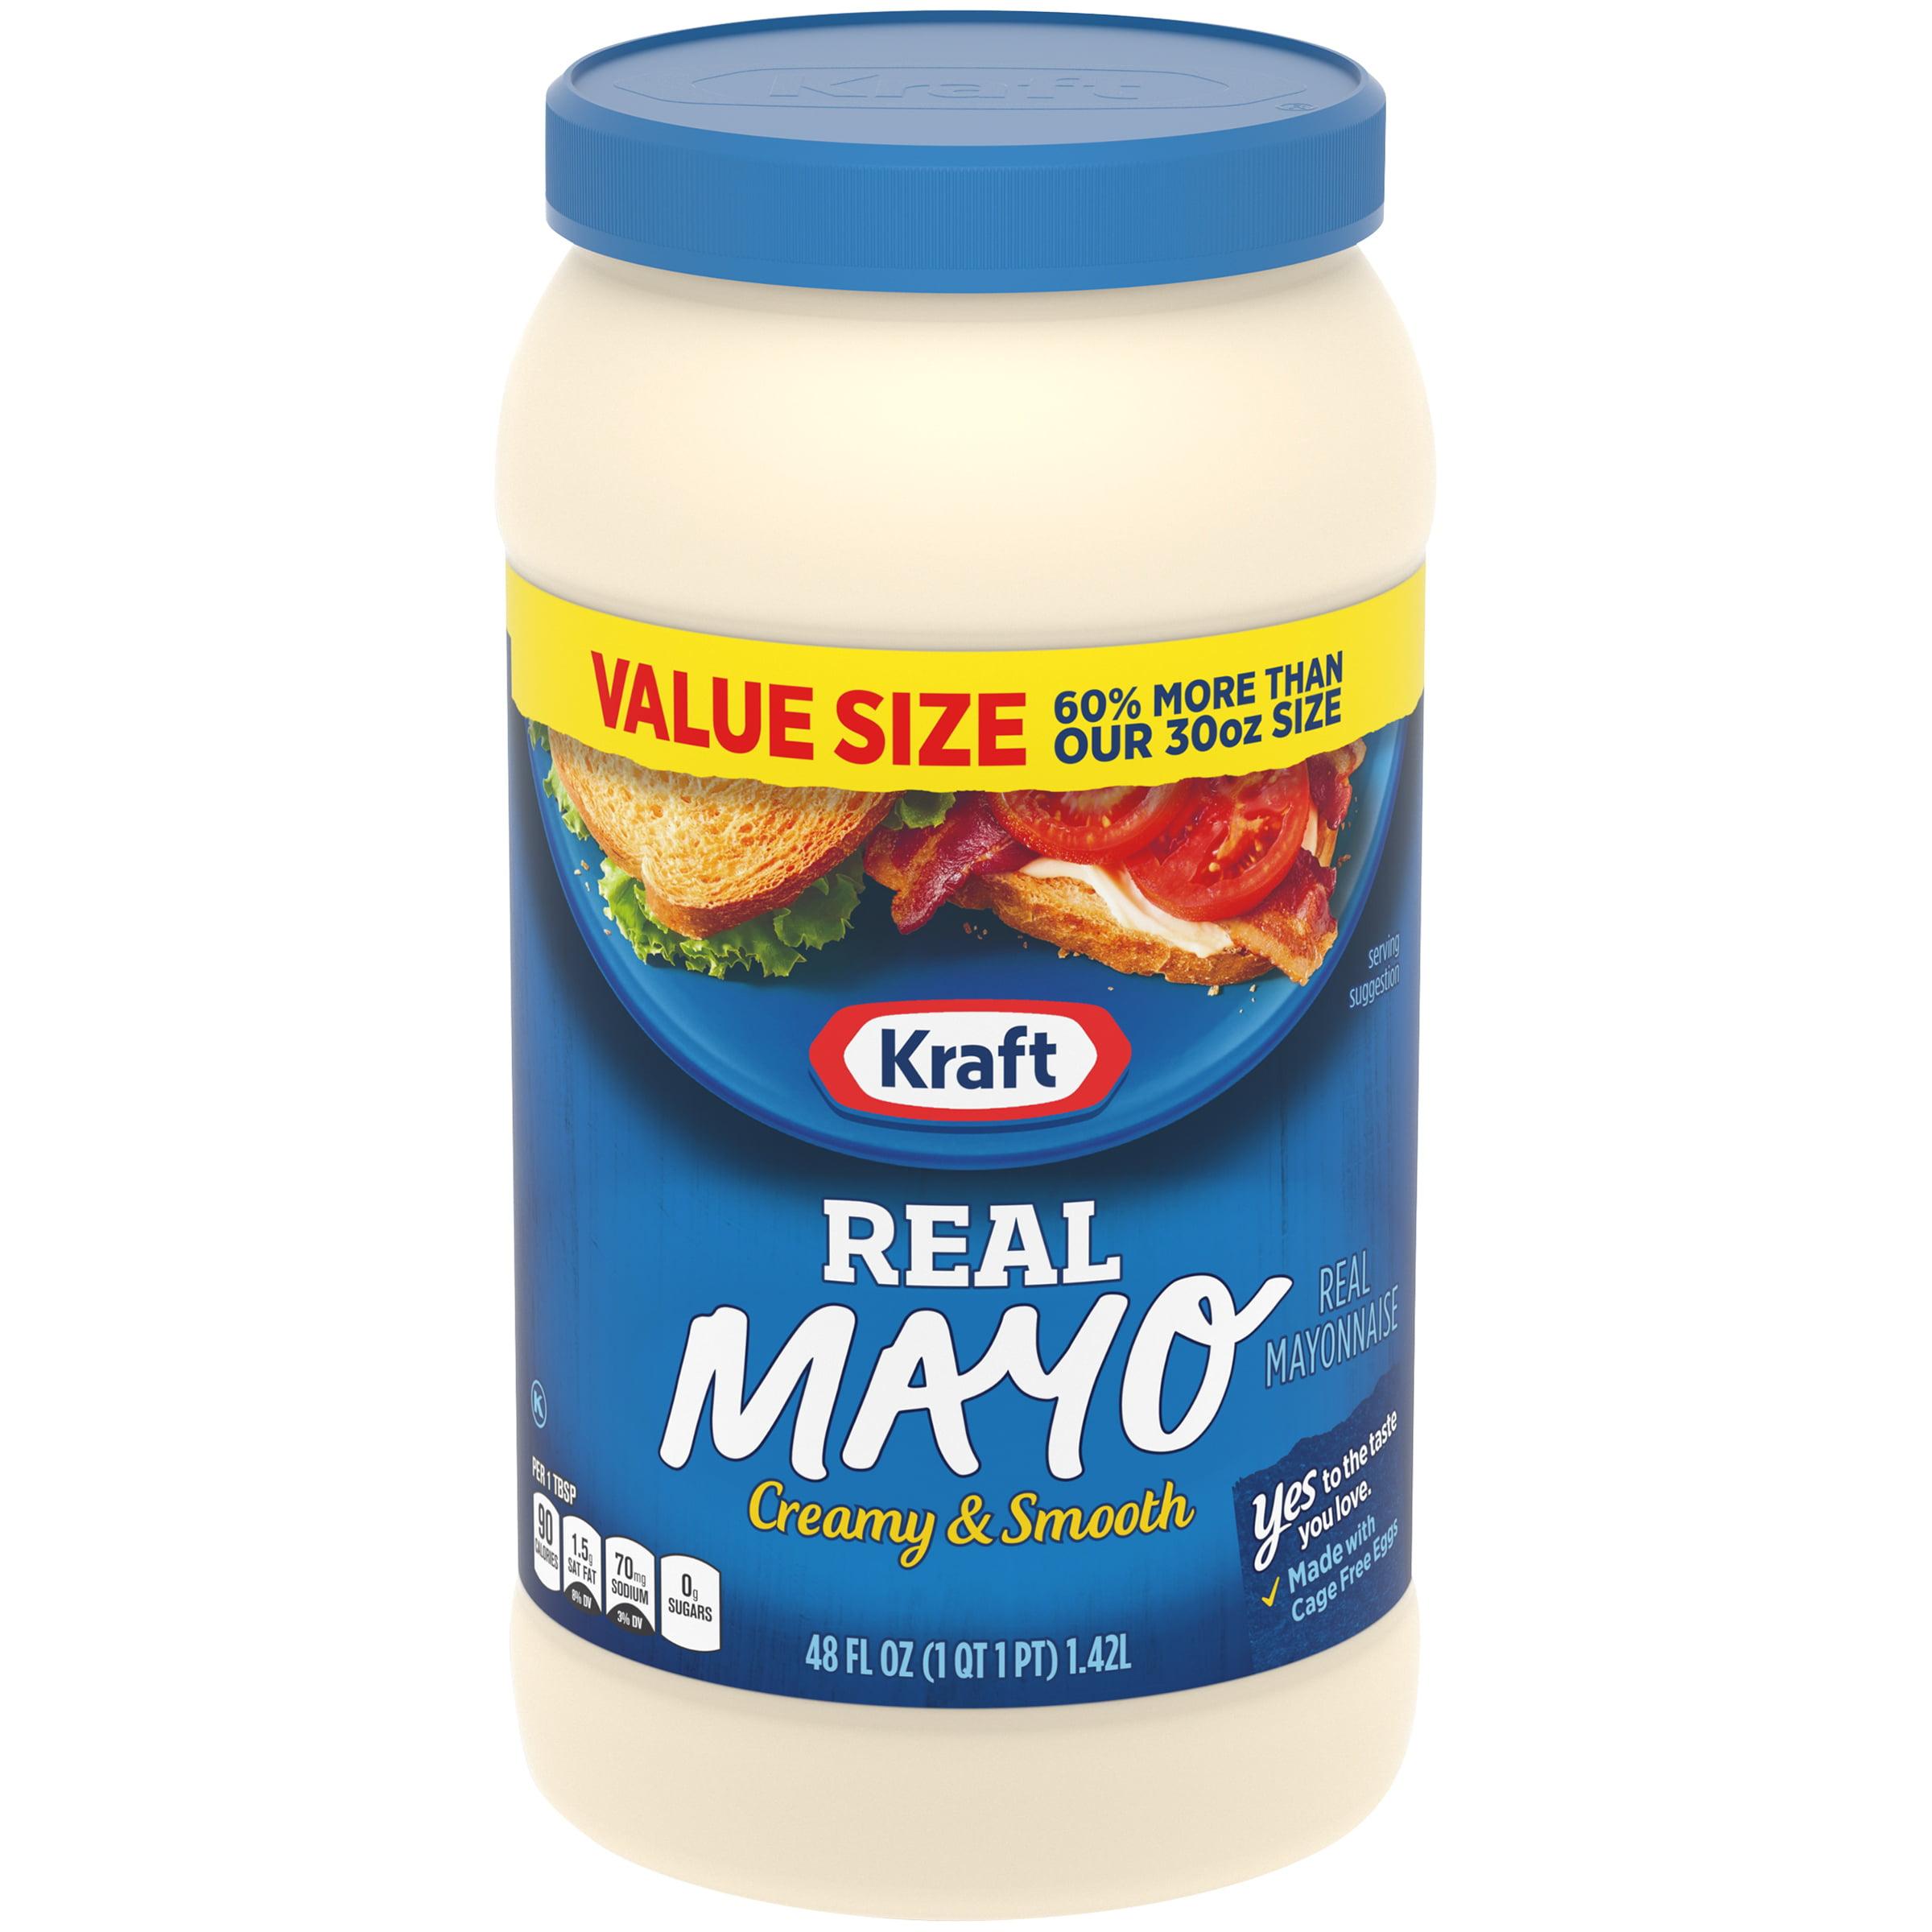 Kraft Real Mayo 48 fl. oz. Jar